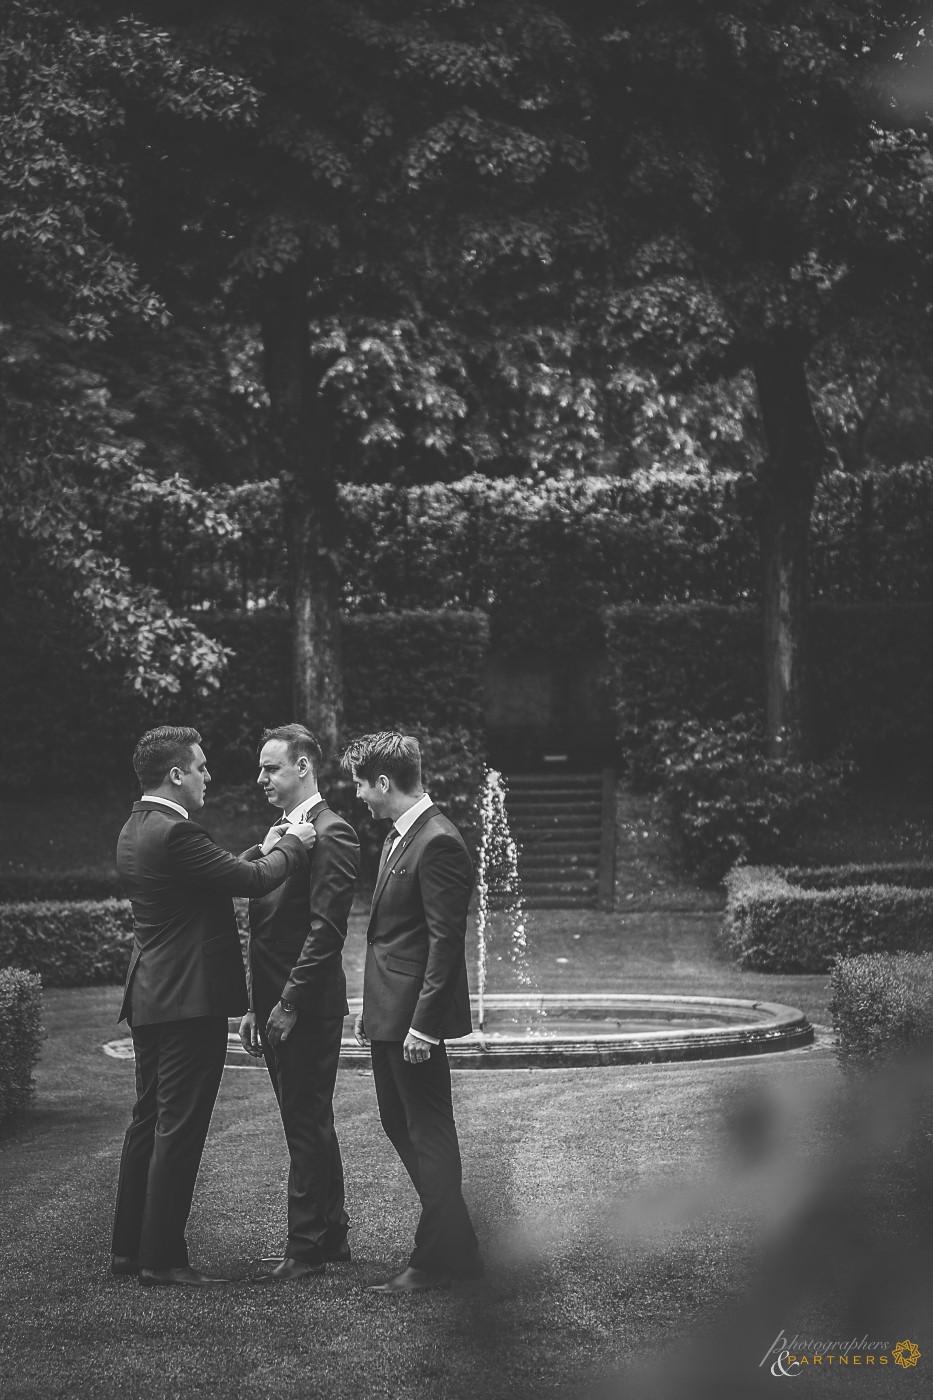 florence_photographers_02.jpg